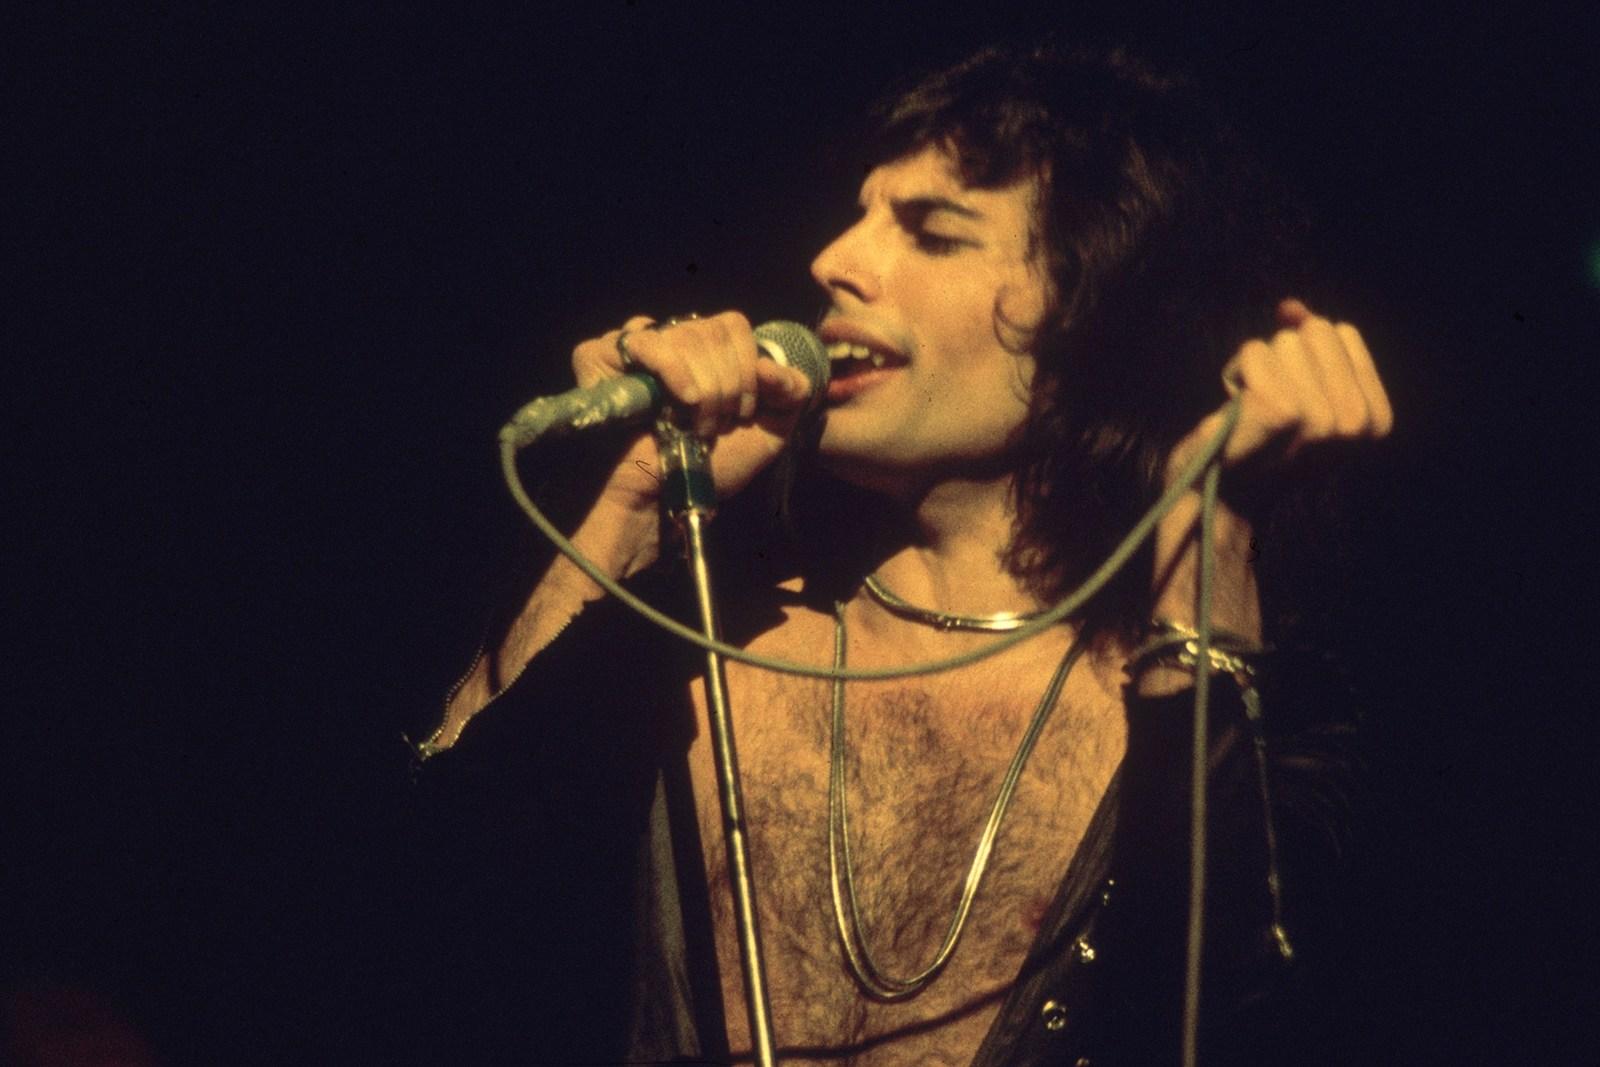 Freddie-Mercury-Queen-Photo.jpg